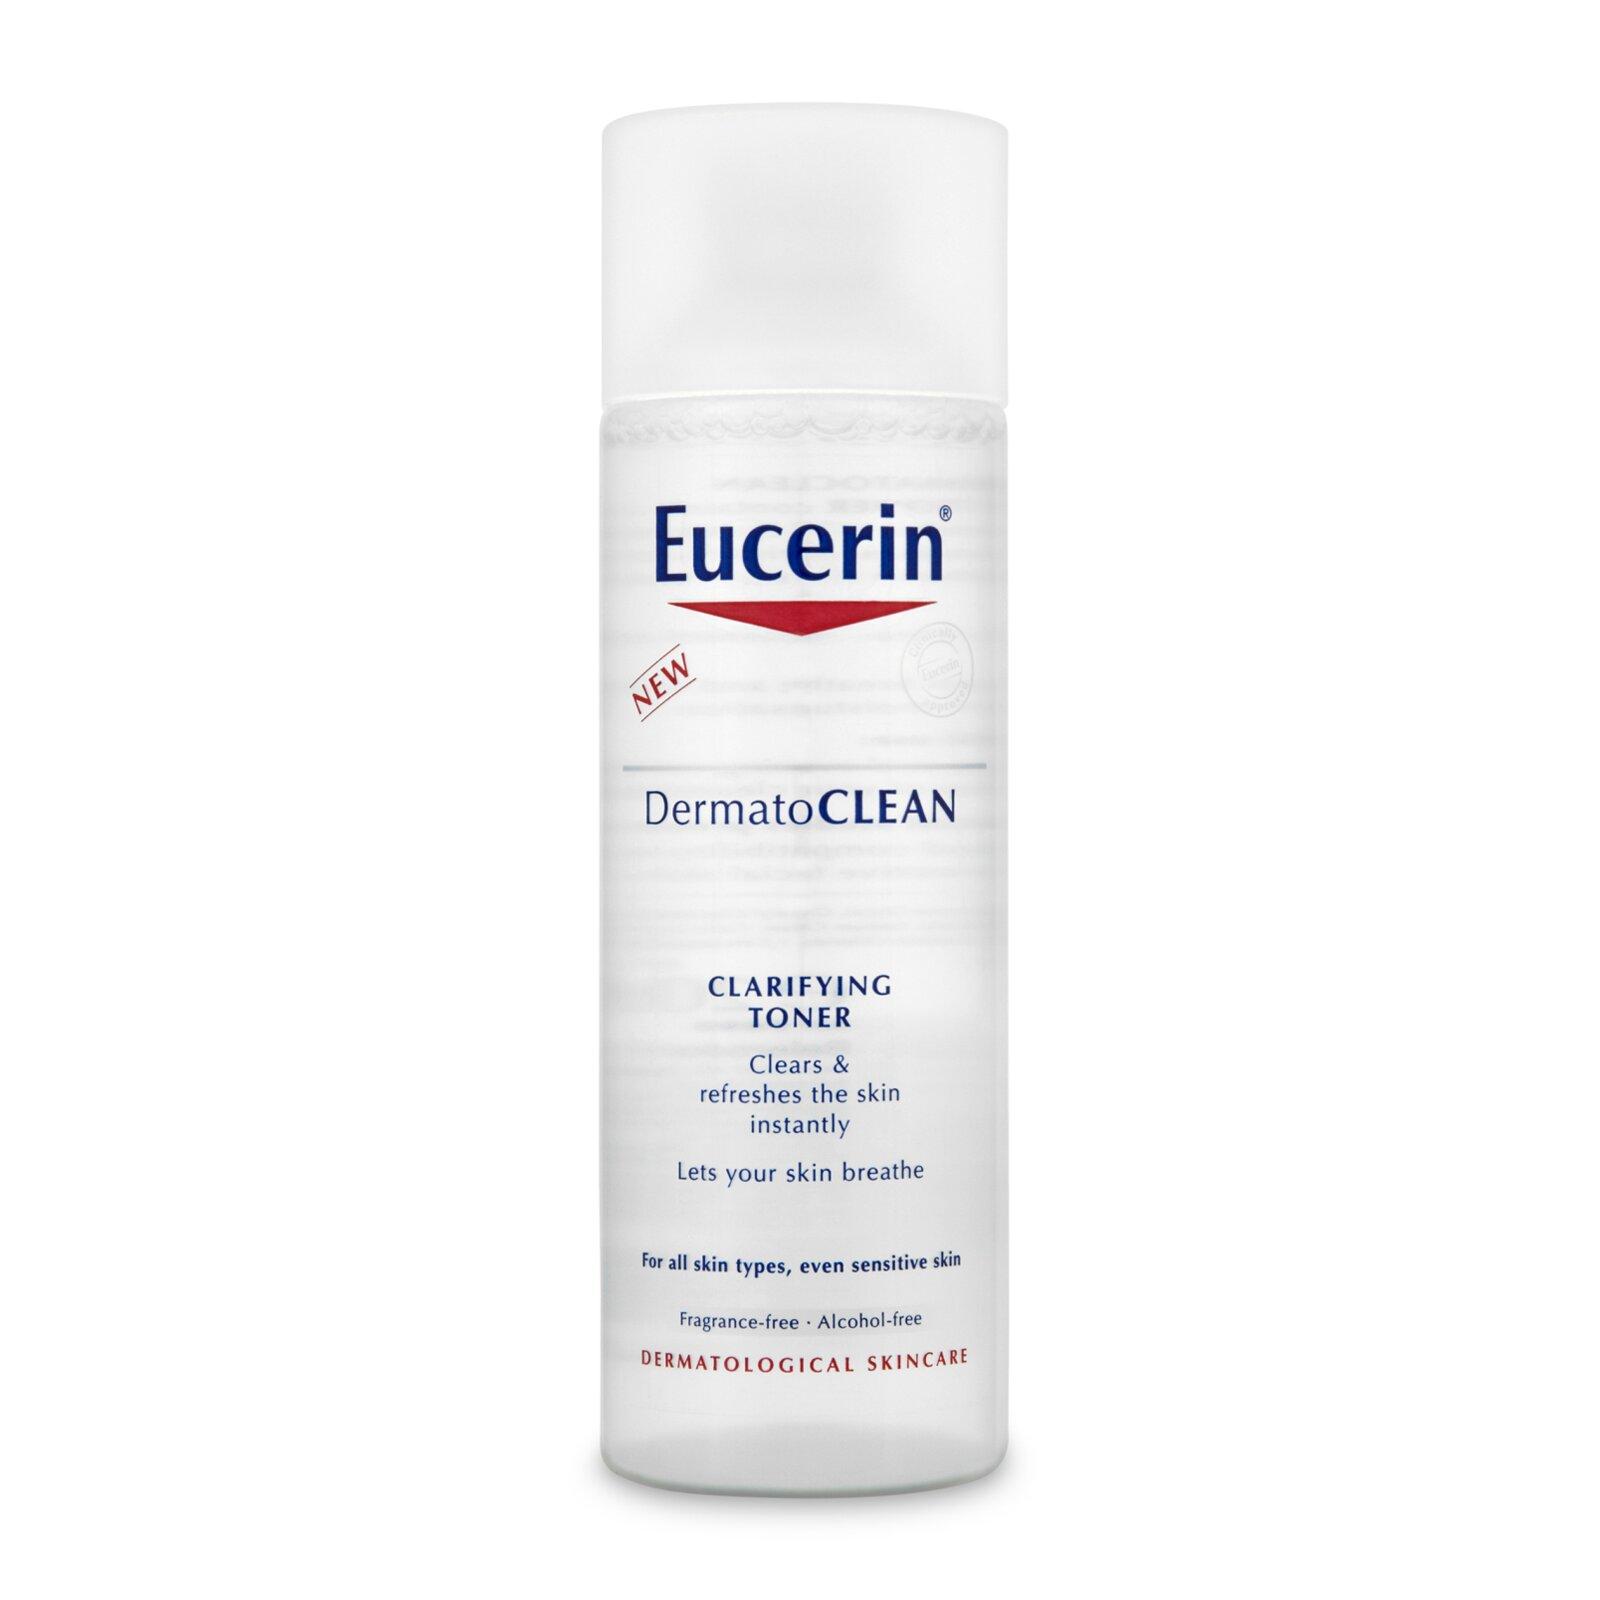 Nước hoa hồng Eucerin Dermatoclean Clarifying Toner - 200ml, cho da nhạy cảm